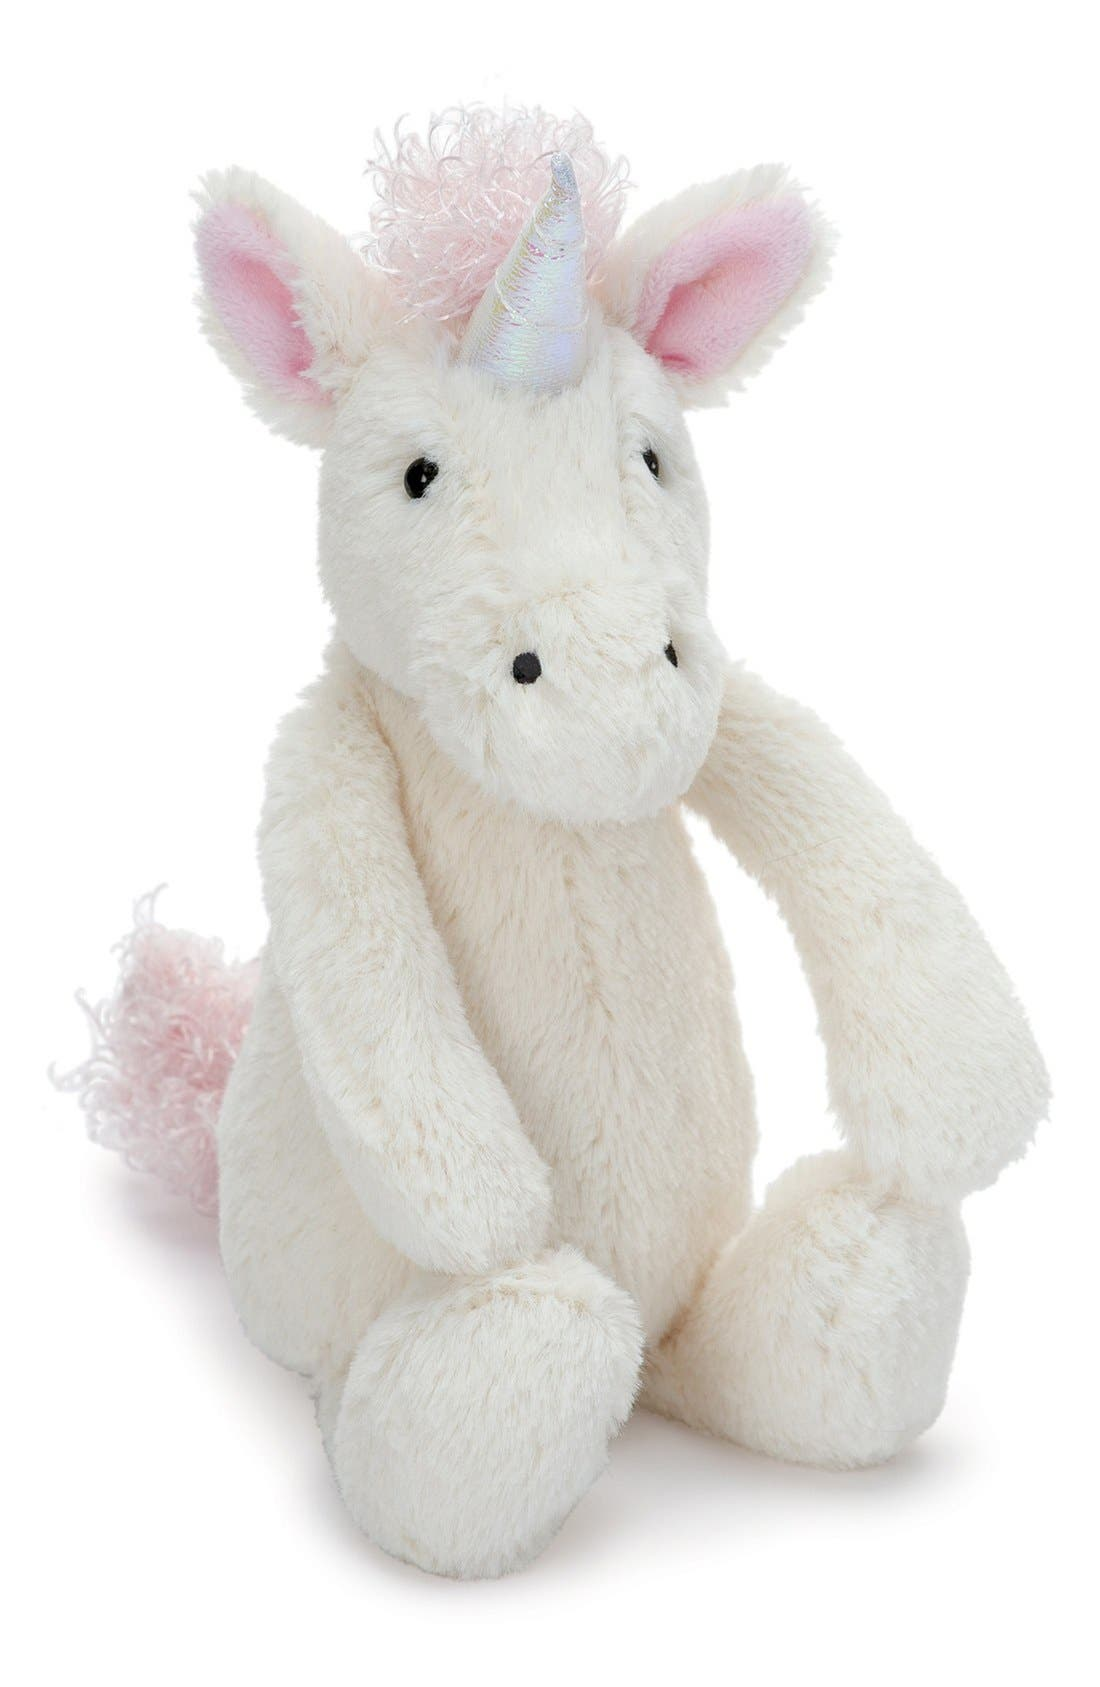 'Small Bashful Unicorn' Stuffed Animal,                         Main,                         color, Cream